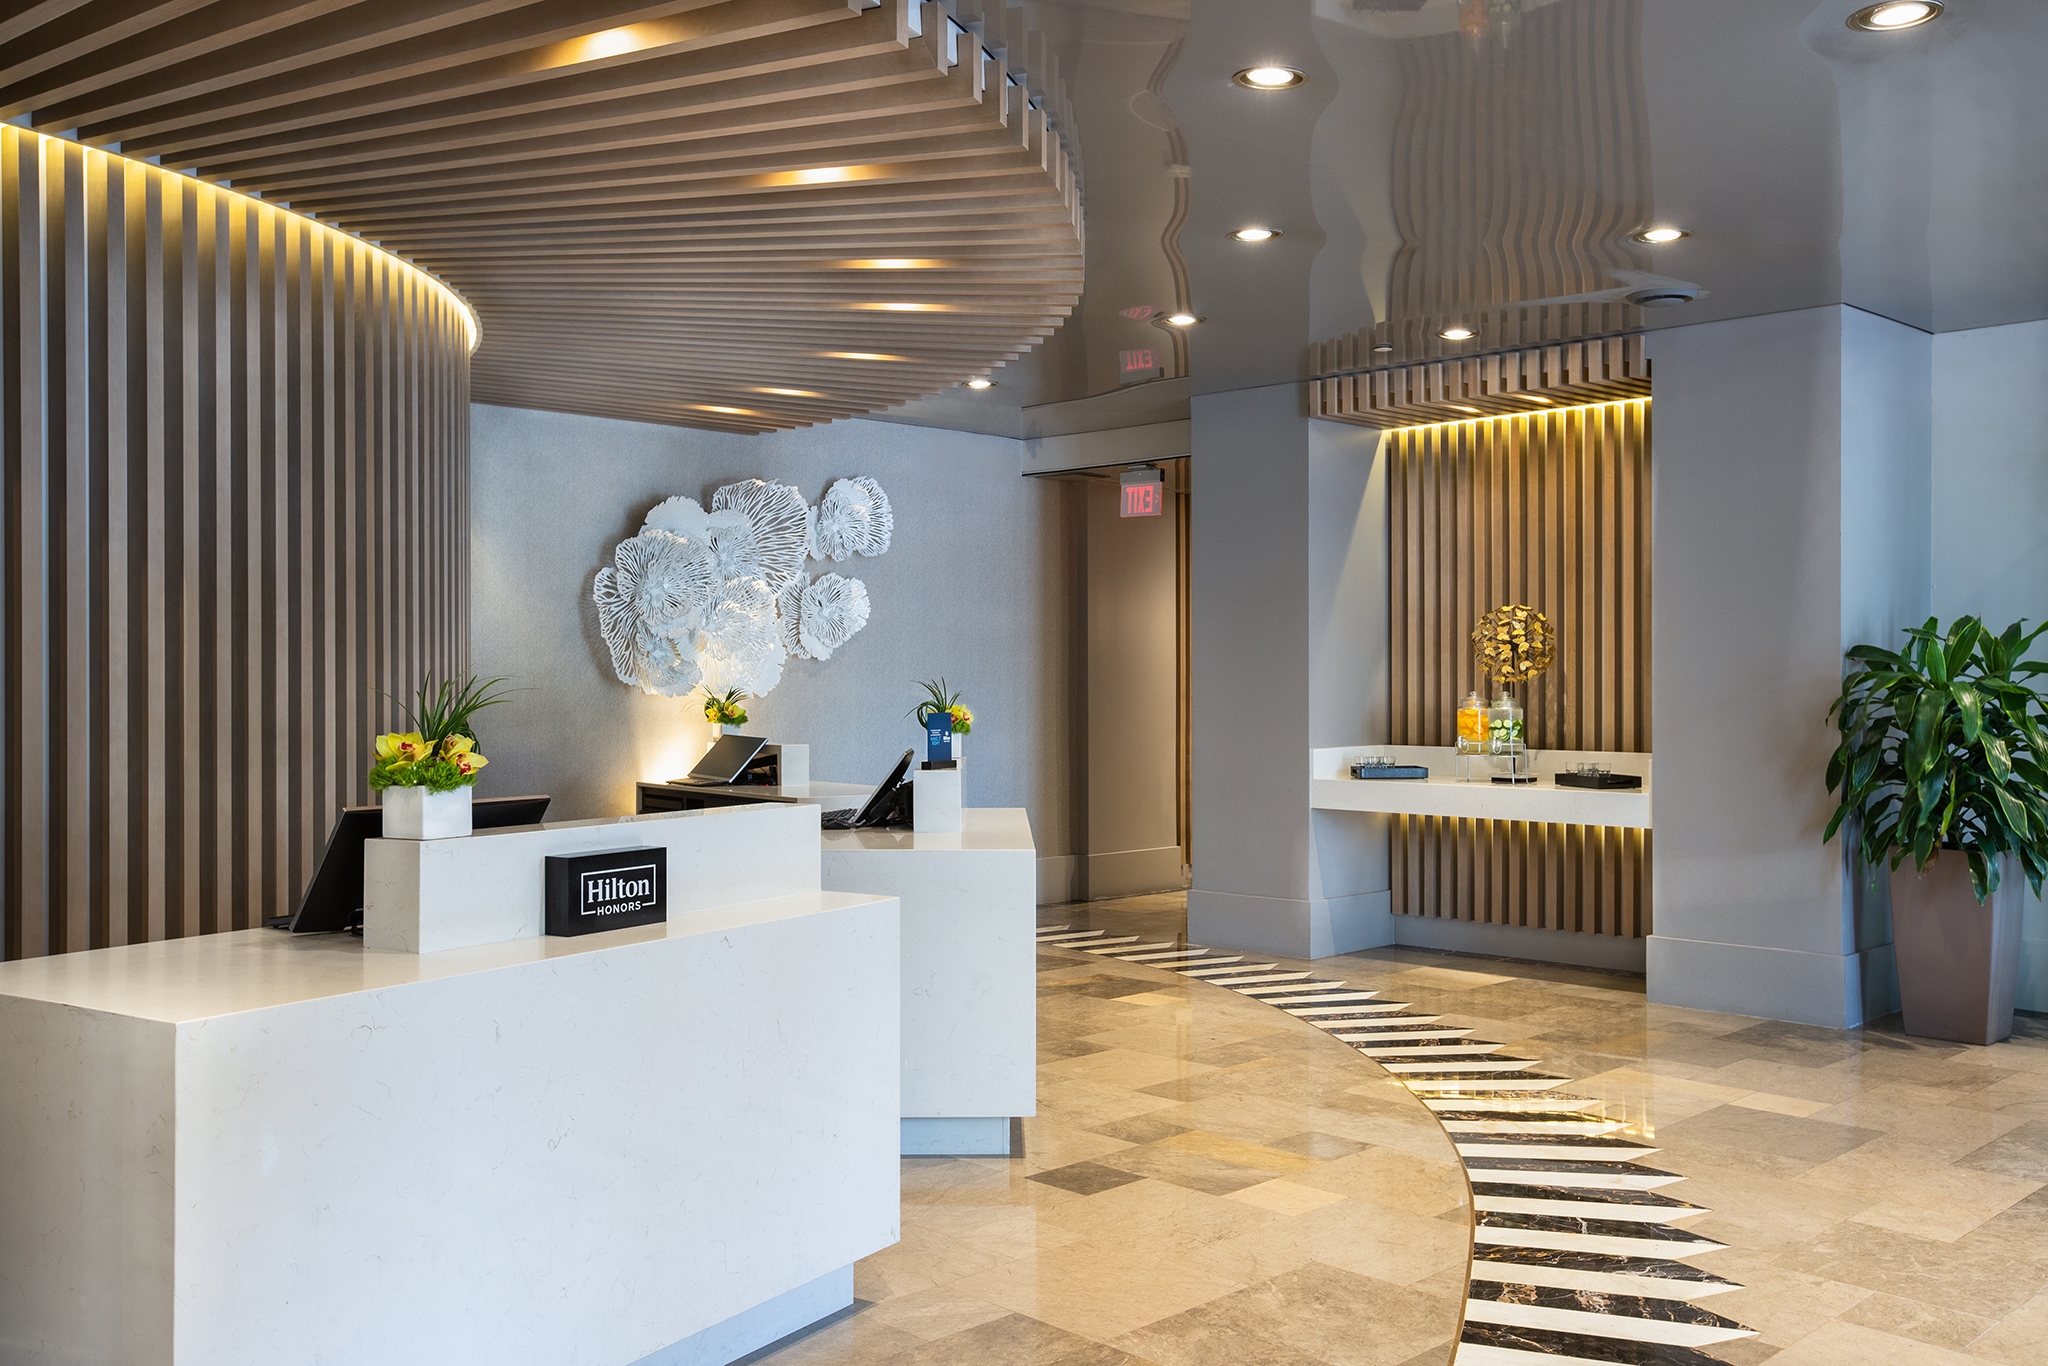 Hilton Bentley Miami South Beach Hotel Lobby 2